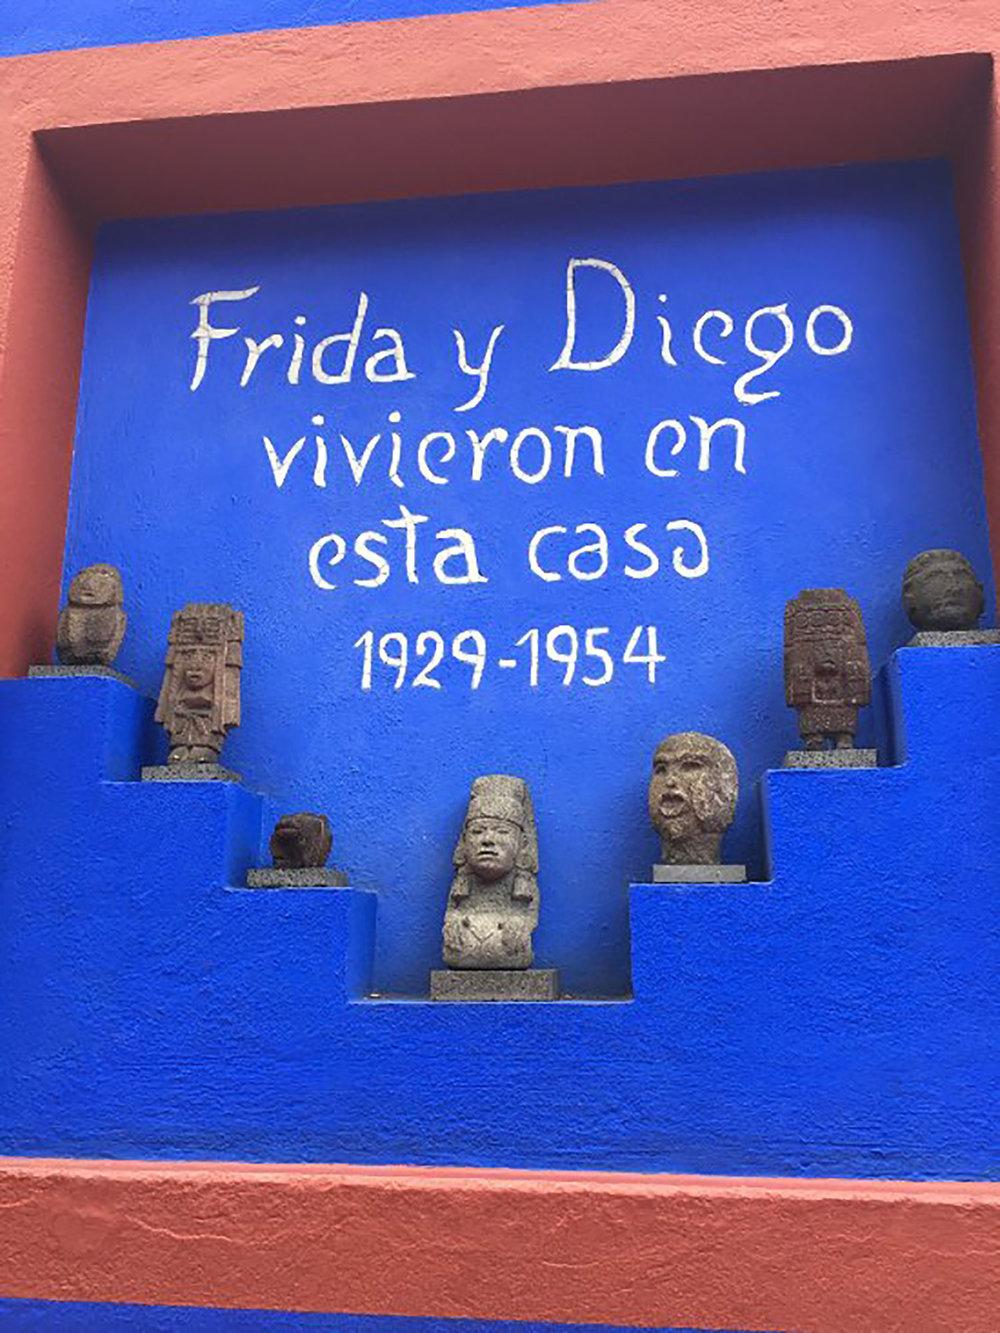 Hammocks_and_Ruins_Riviera_Maya_Mexico_Stories_Mayan_Mythology_Towns_Cities_What_to_Do_Mexico_City_Cuidad_Museums_Frida_Khalo_Blue_House_13.jpg